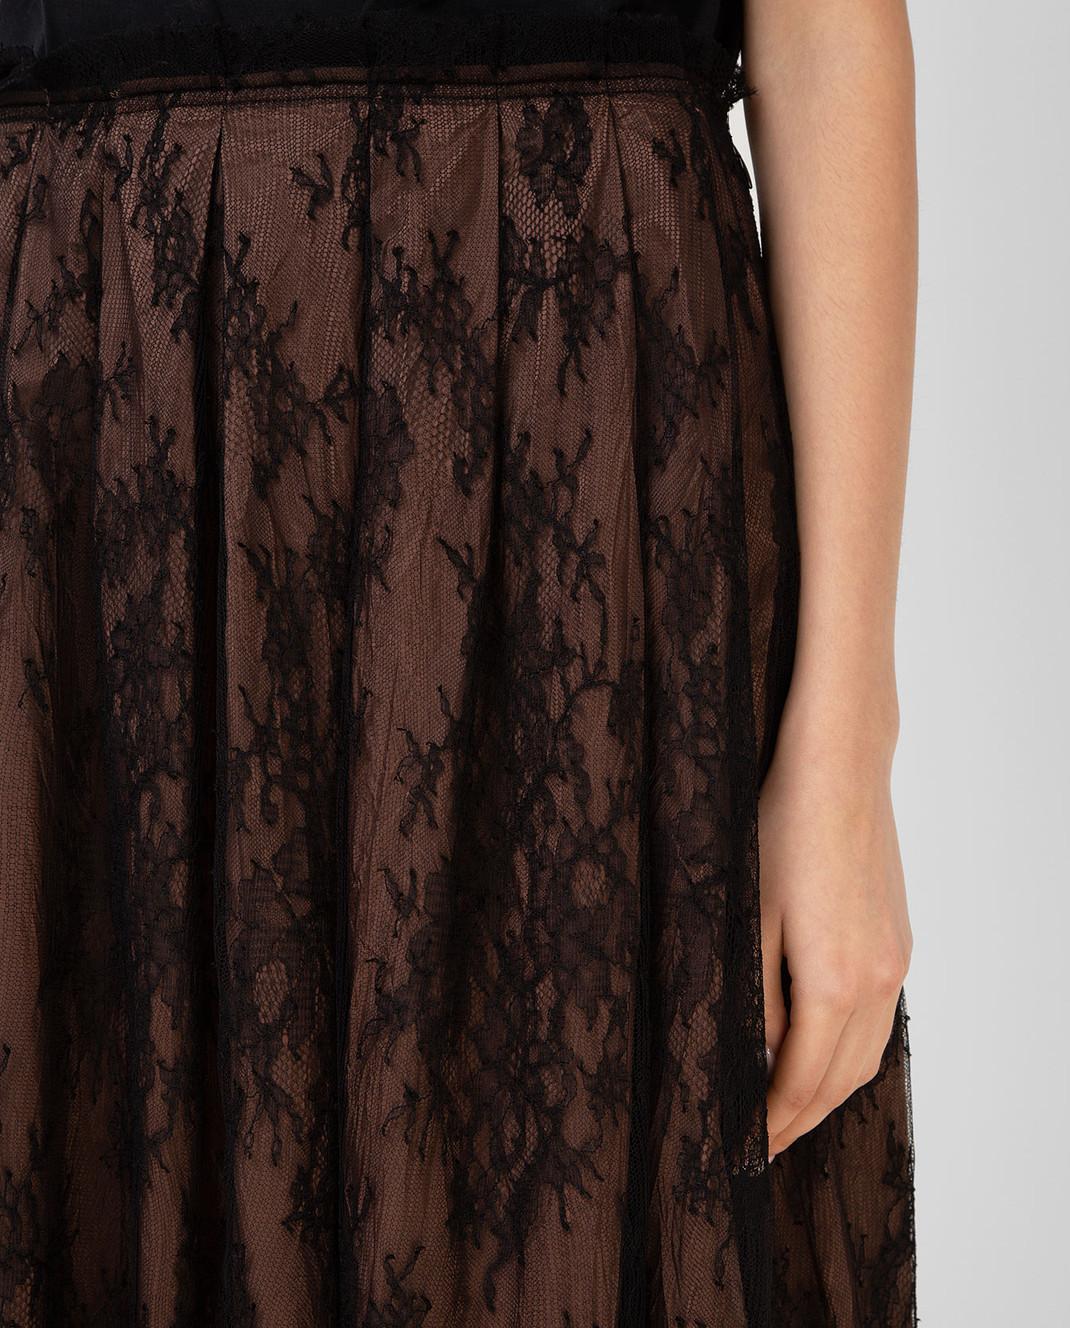 Valentino Коричневая юбка MB3RA295313 изображение 5